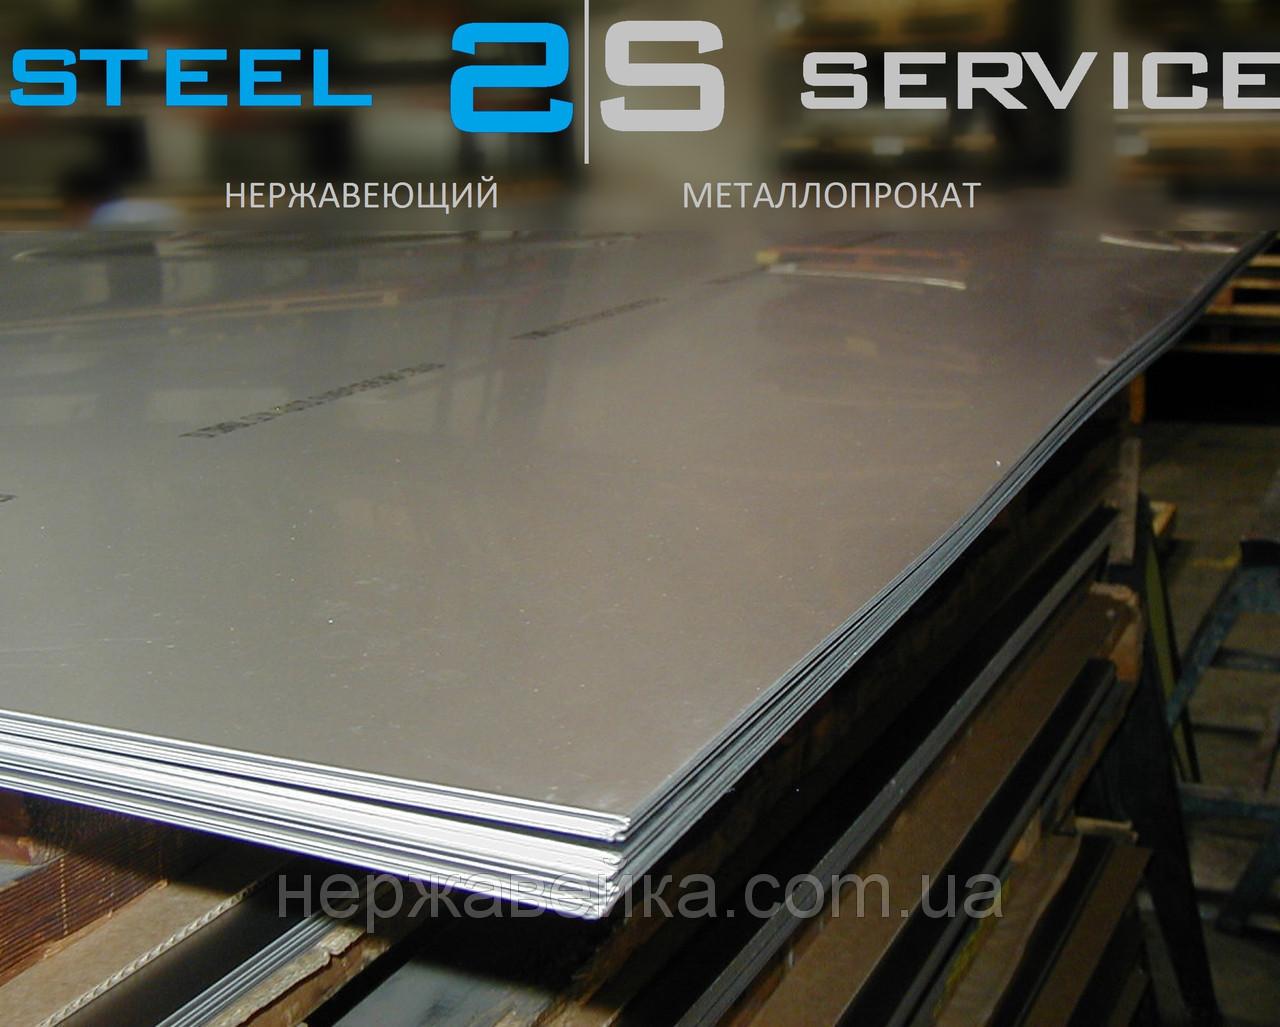 Листовая нержавейка 0,8х1000х2000мм  AISI 316L(03Х17Н14М3) 2B - матовый,  кислотостойкий